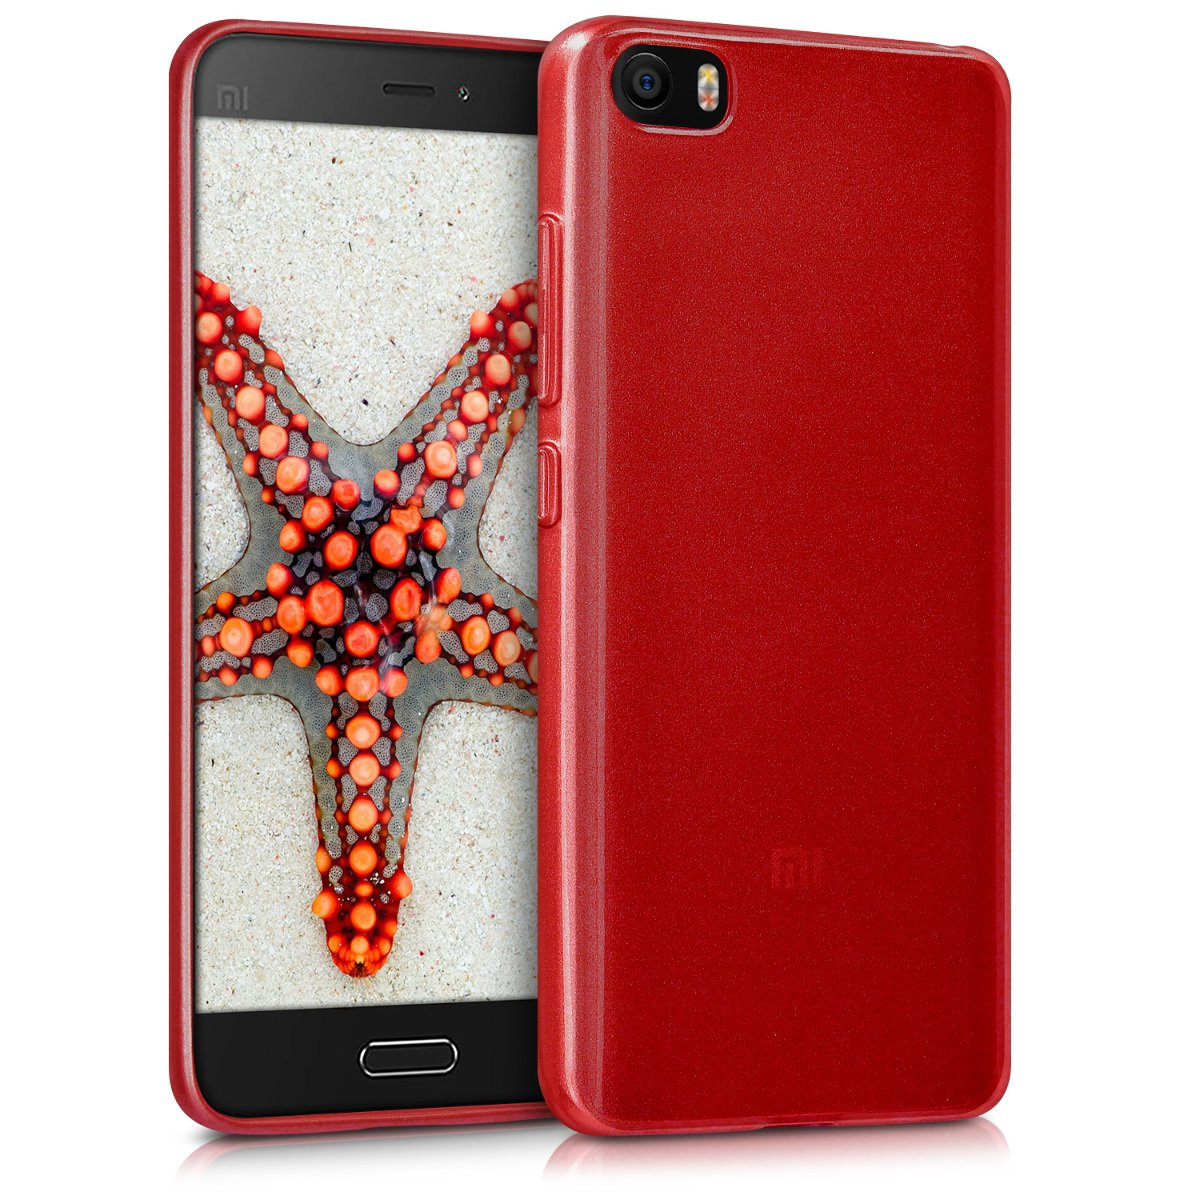 kwmobile Funda para Xiaomi MI5 - Carcasa para móvil en [TPU Silicona] - Protector [Trasero] en [Rojo Brillante]